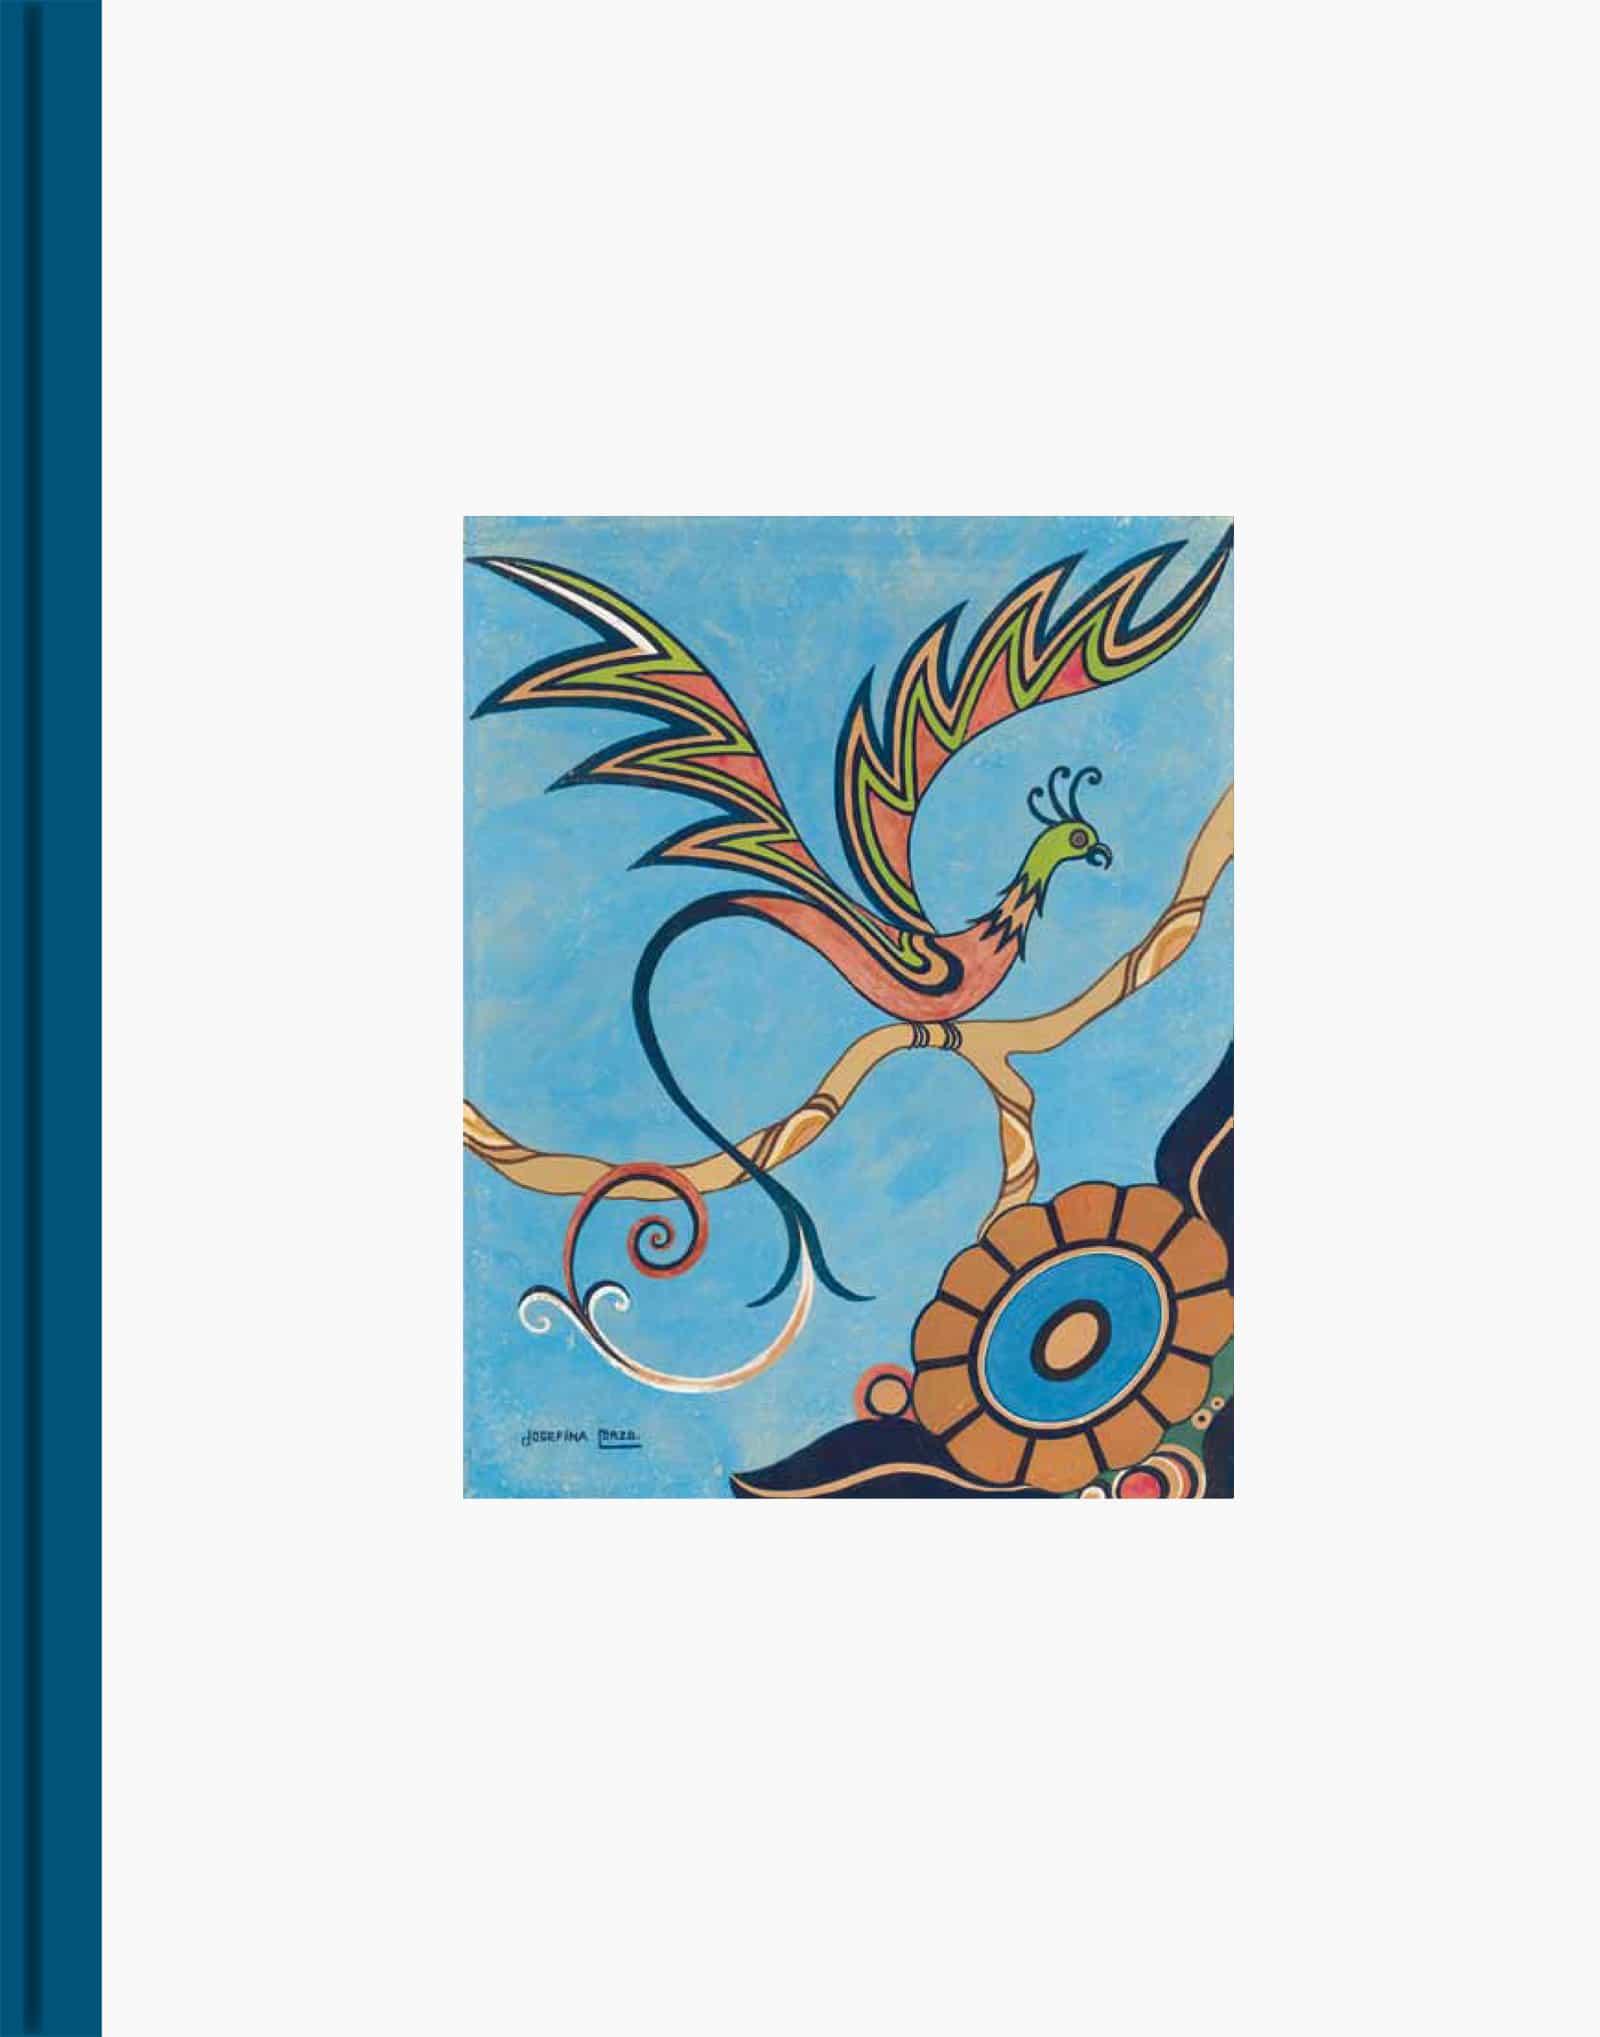 diango-hernandez_tb-cover